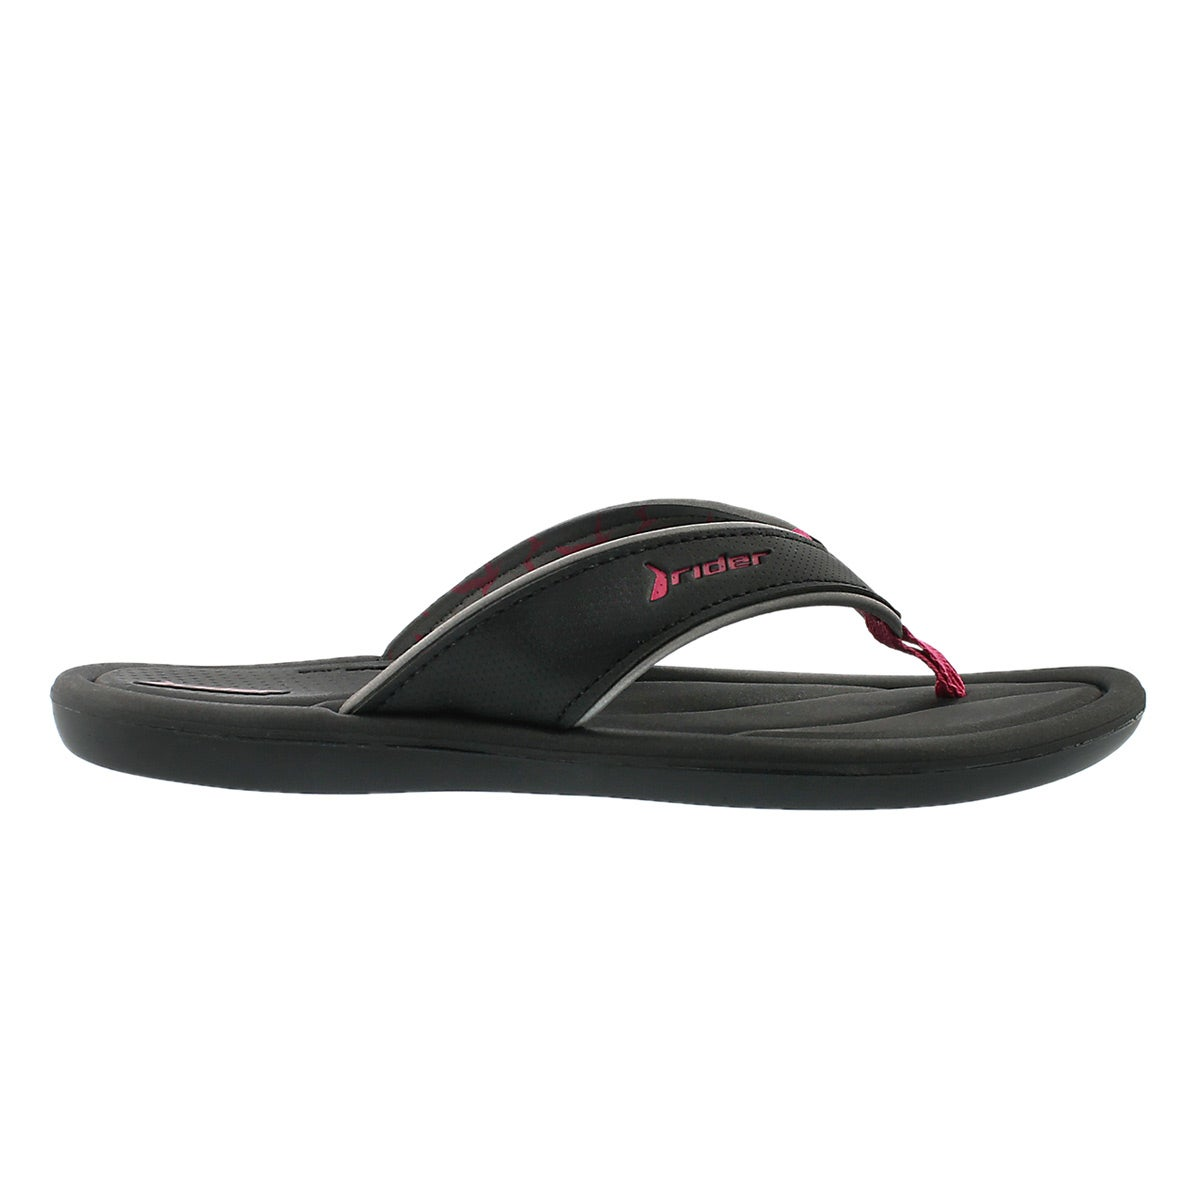 Lds Cloud III black flip flop sandal